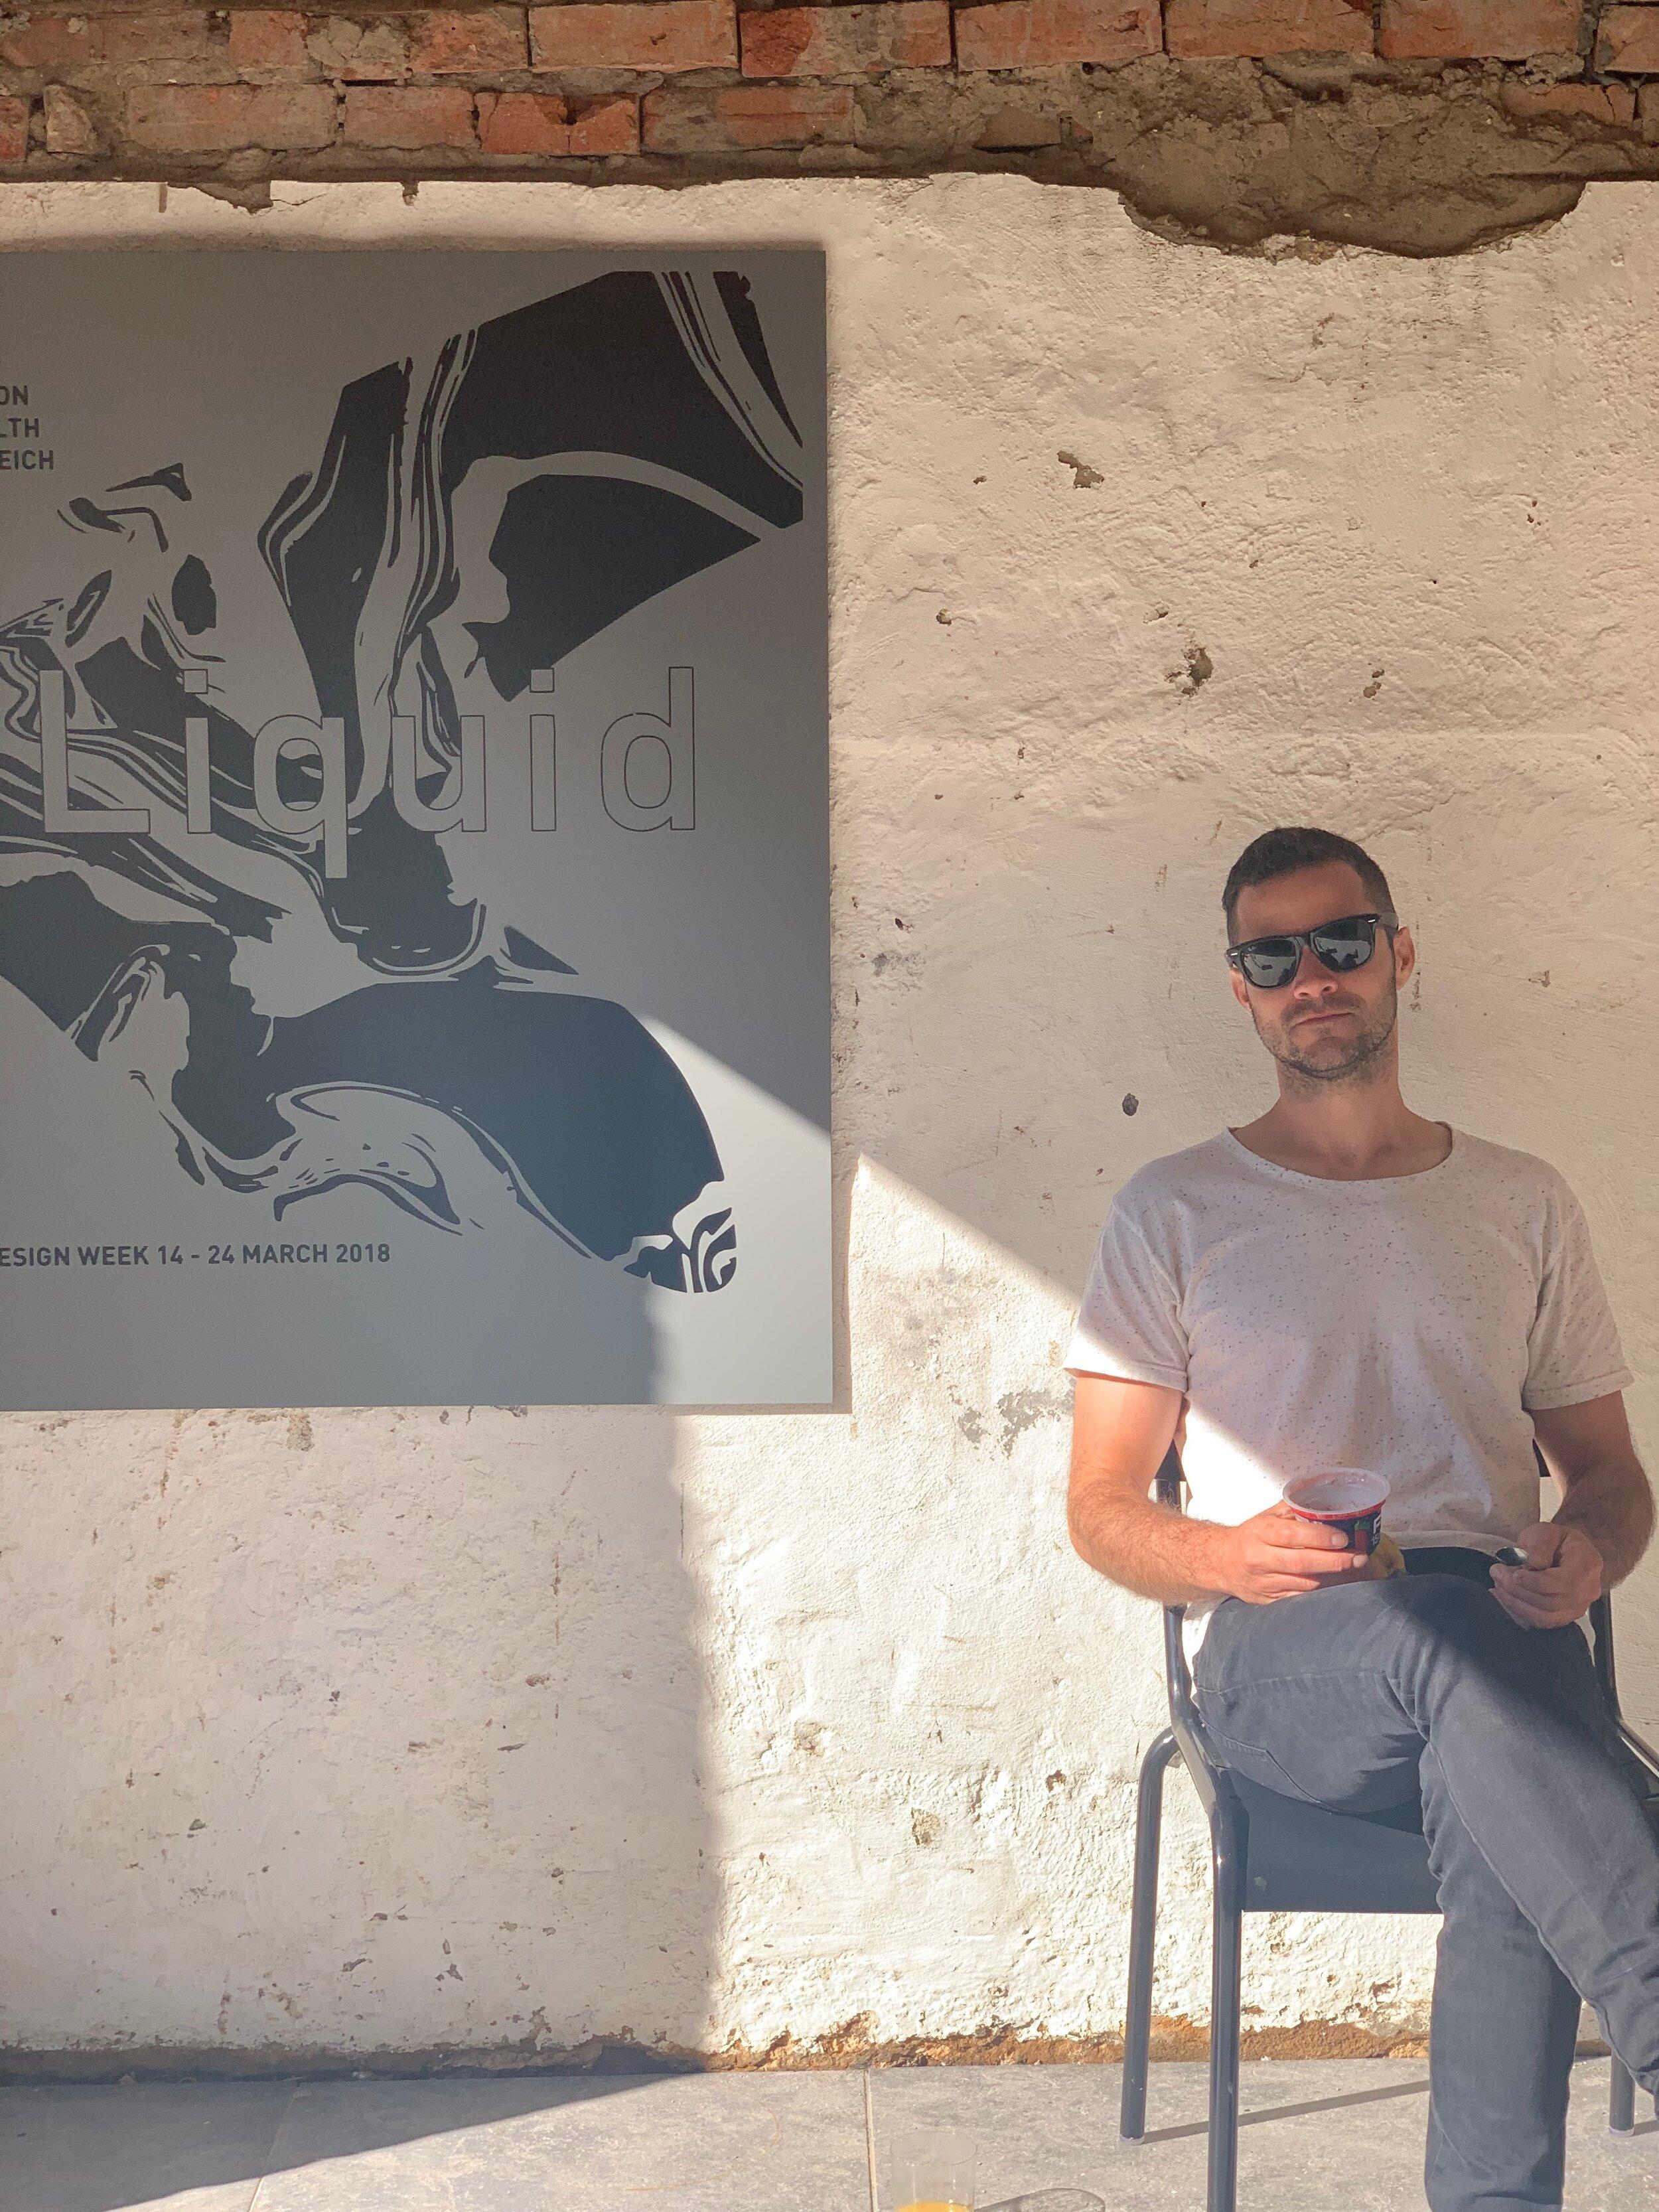 exhibition curator and furniture designer Elliot Bastianon with artwork decal